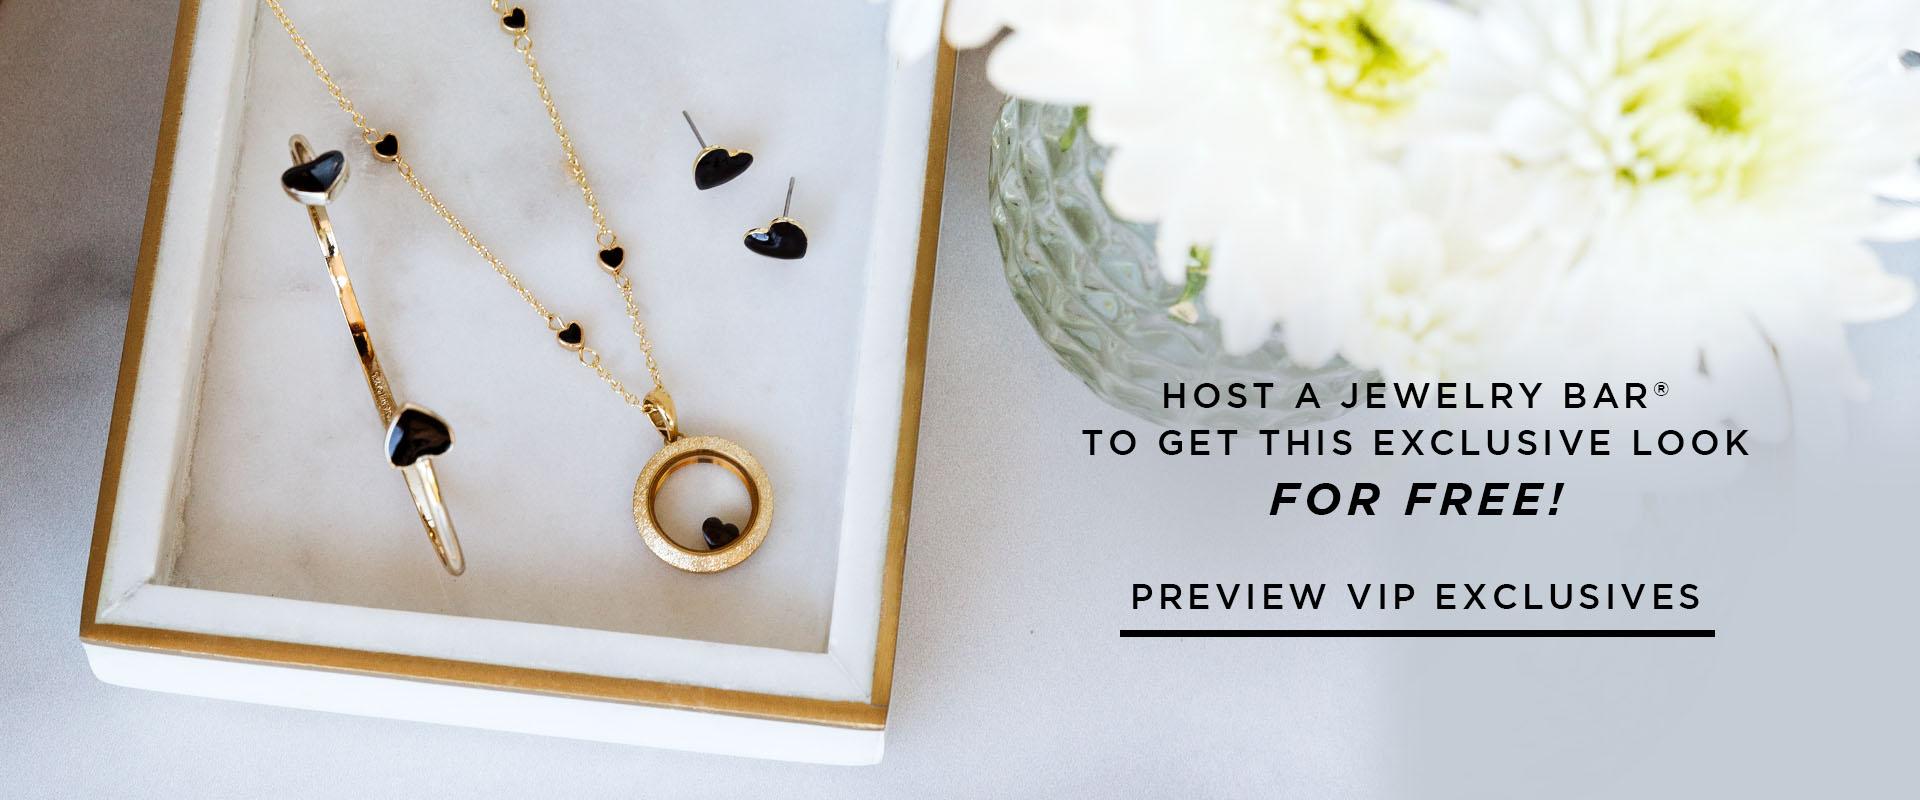 Host a Jewelry Bar as a Hostess